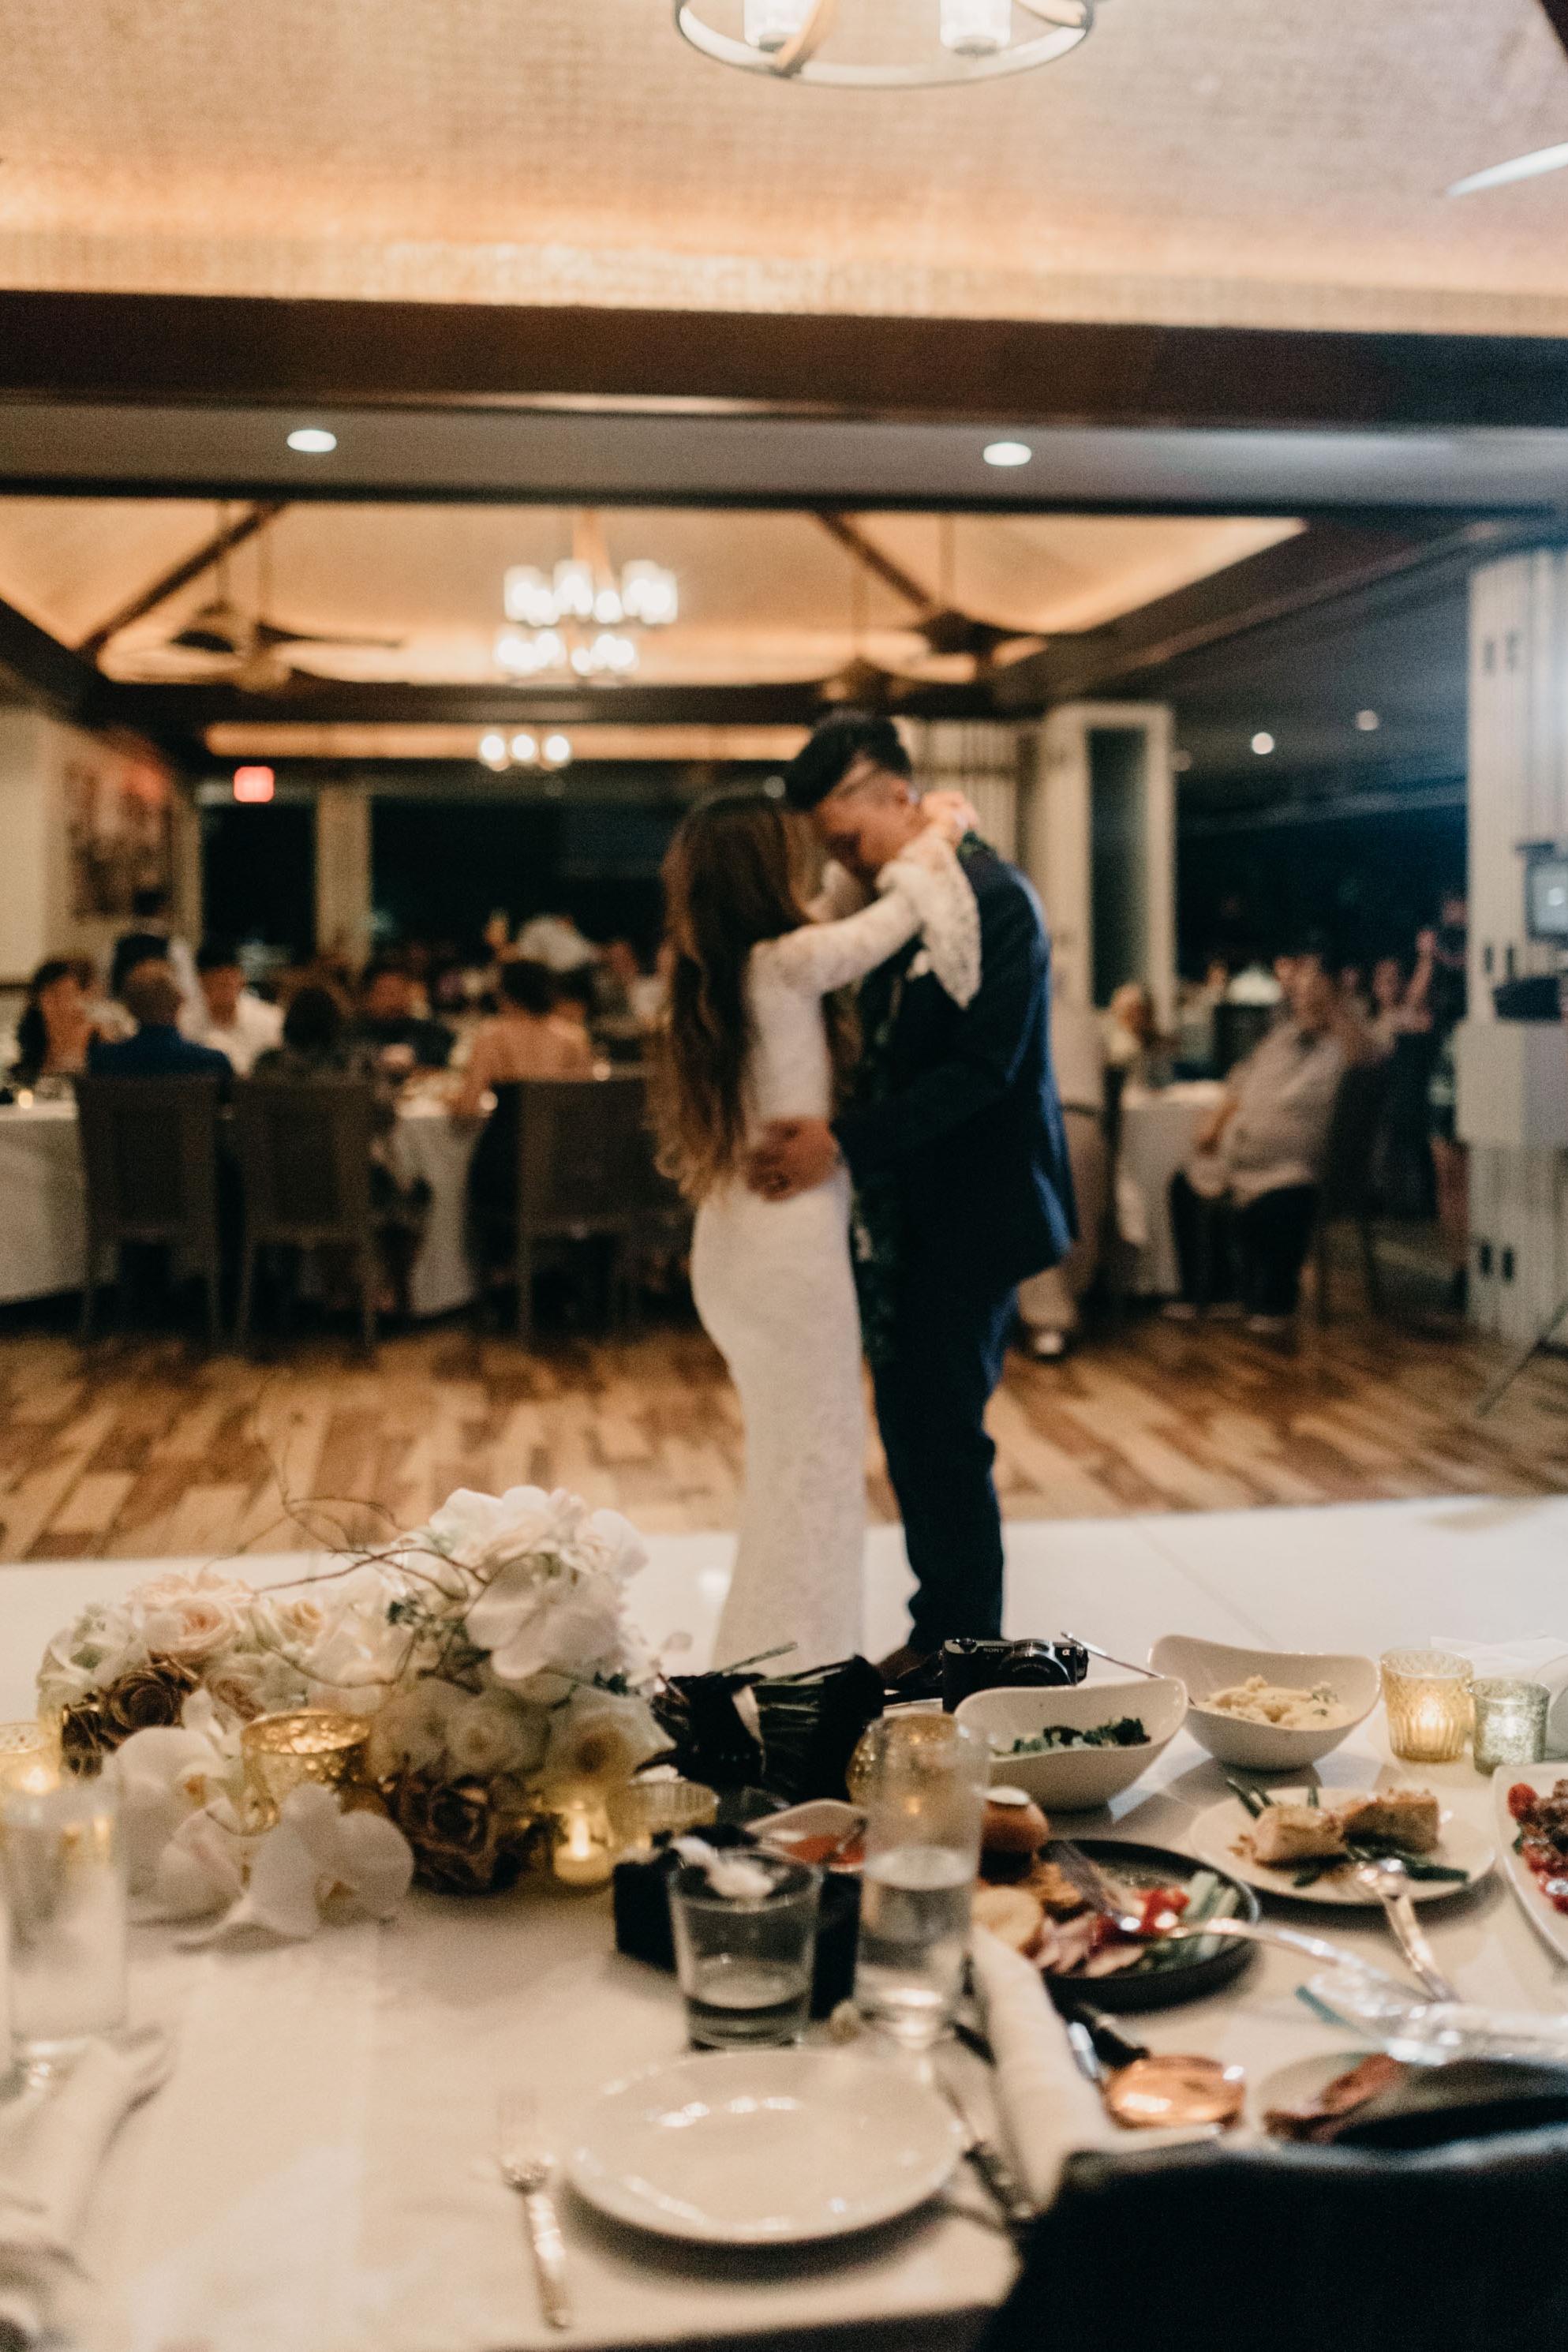 Bride and groom first dance   Merriman's Kapalua Maui wedding by Hawaii wedding photographer Desiree Leilani